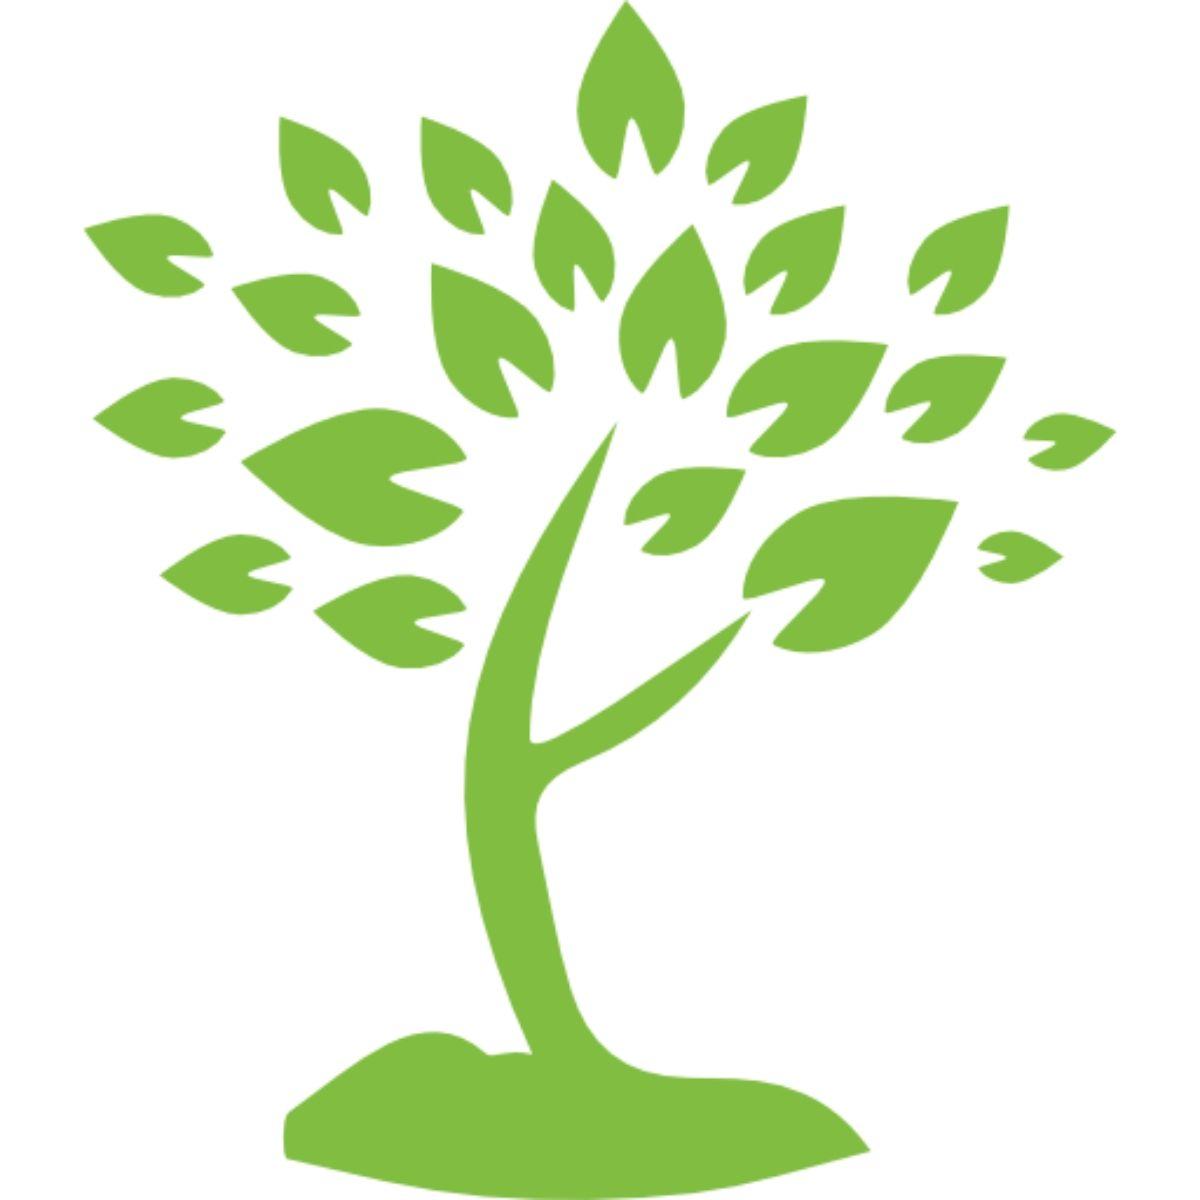 Physi Baum Icon